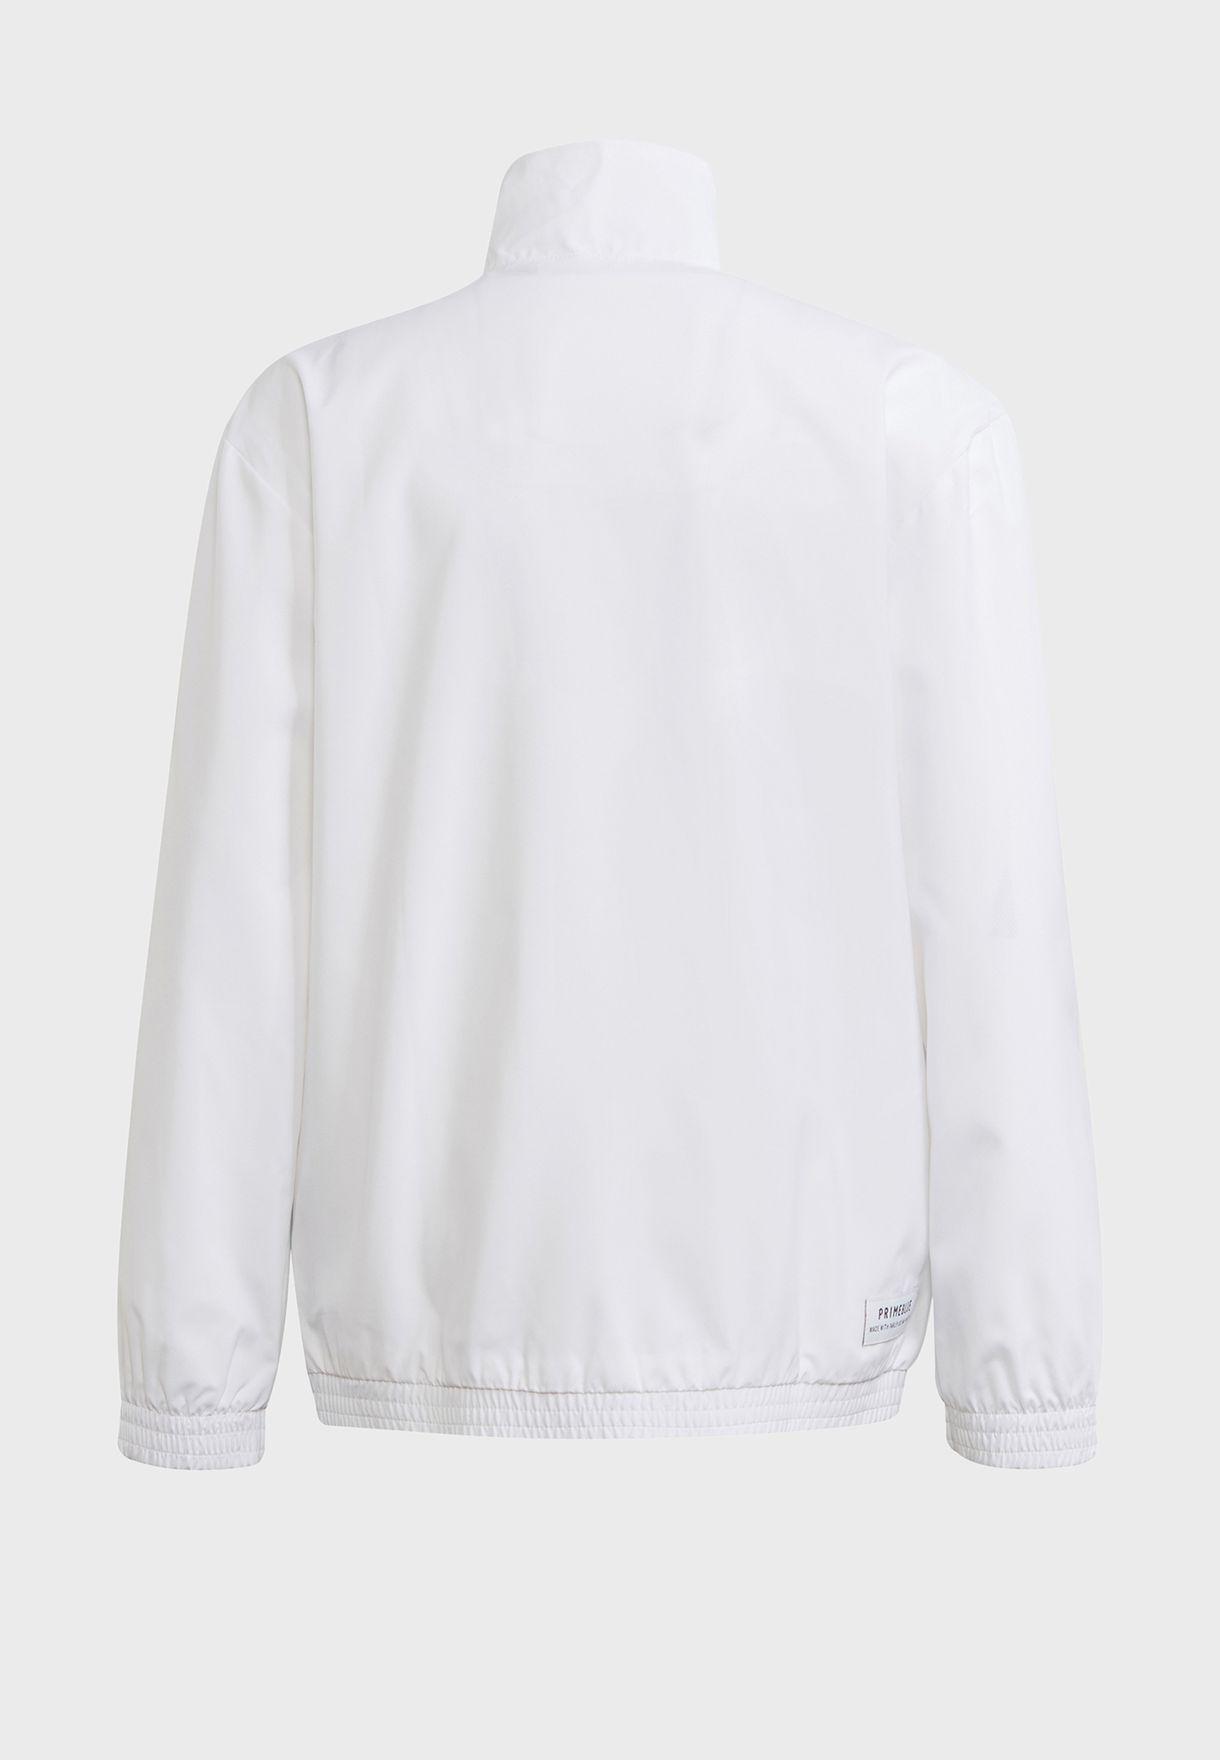 Youth Aaron Kai Primeblue Windbreaker Jacket